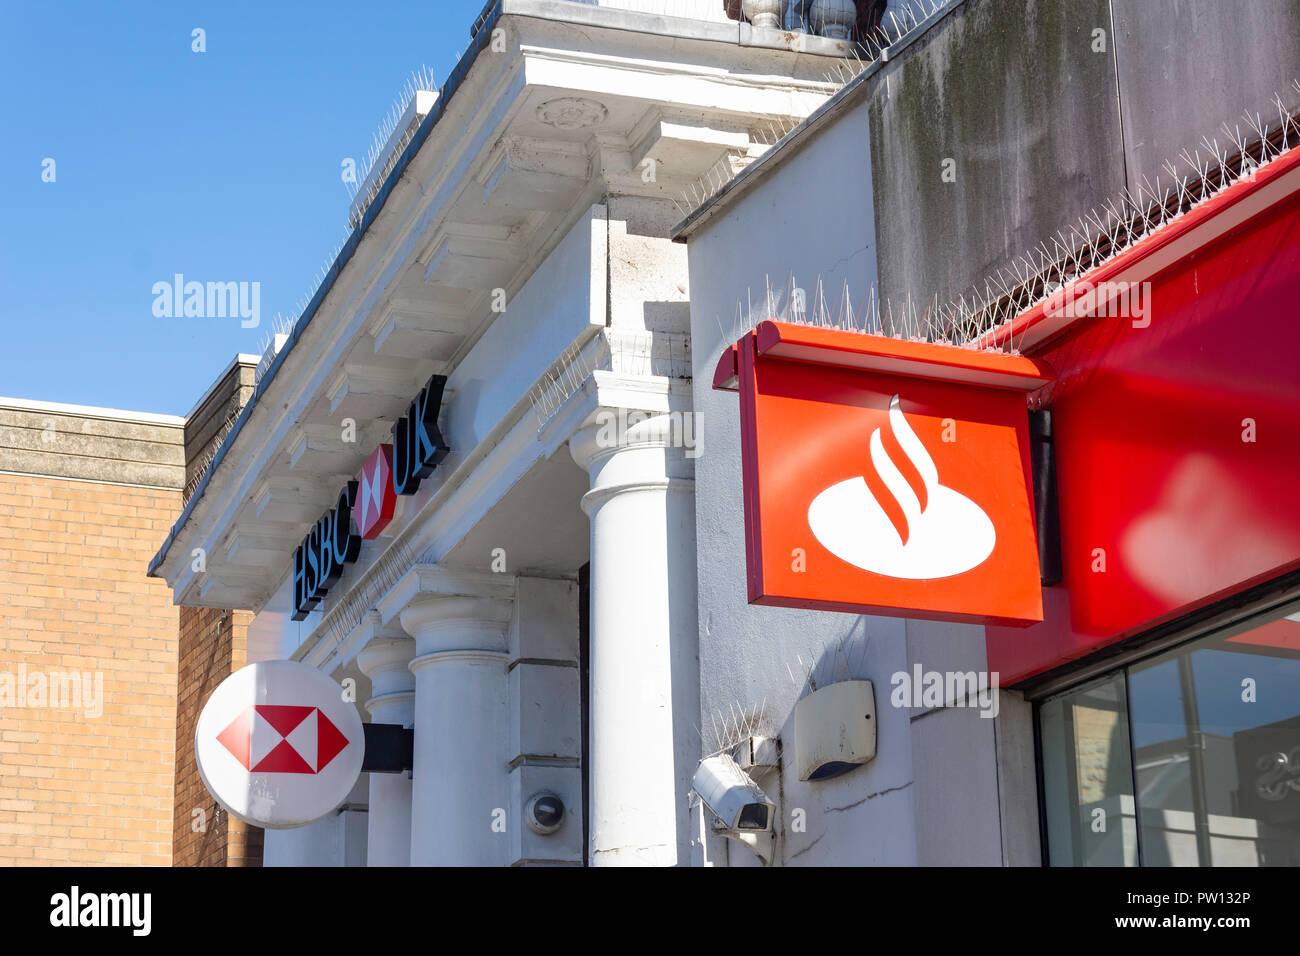 HSBC and Santander banks, High Street, Barnet, London Borough of Barnet, Greater London, England, United Kingdom - Stock Image